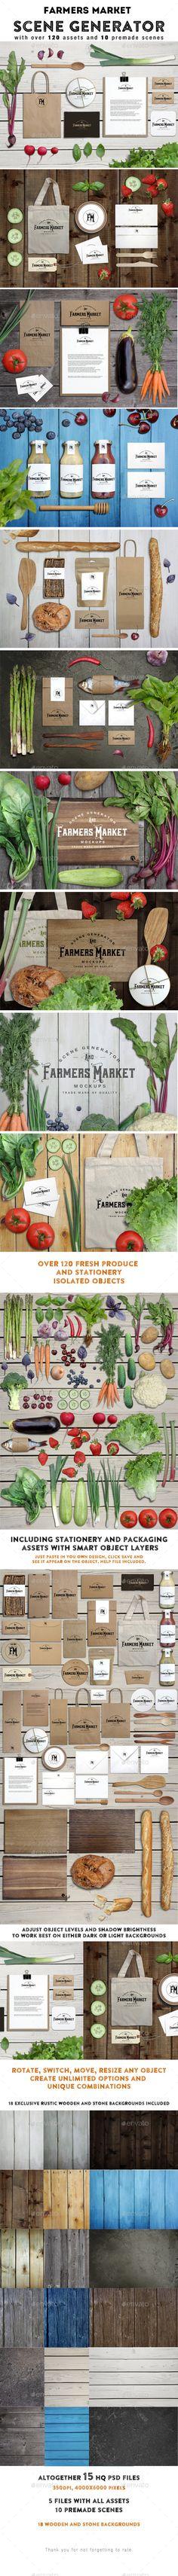 Farmers Market Scene Generator #design Download: http://graphicriver.net/item/farmers-market-scene-generator/11831400?ref=ksioks